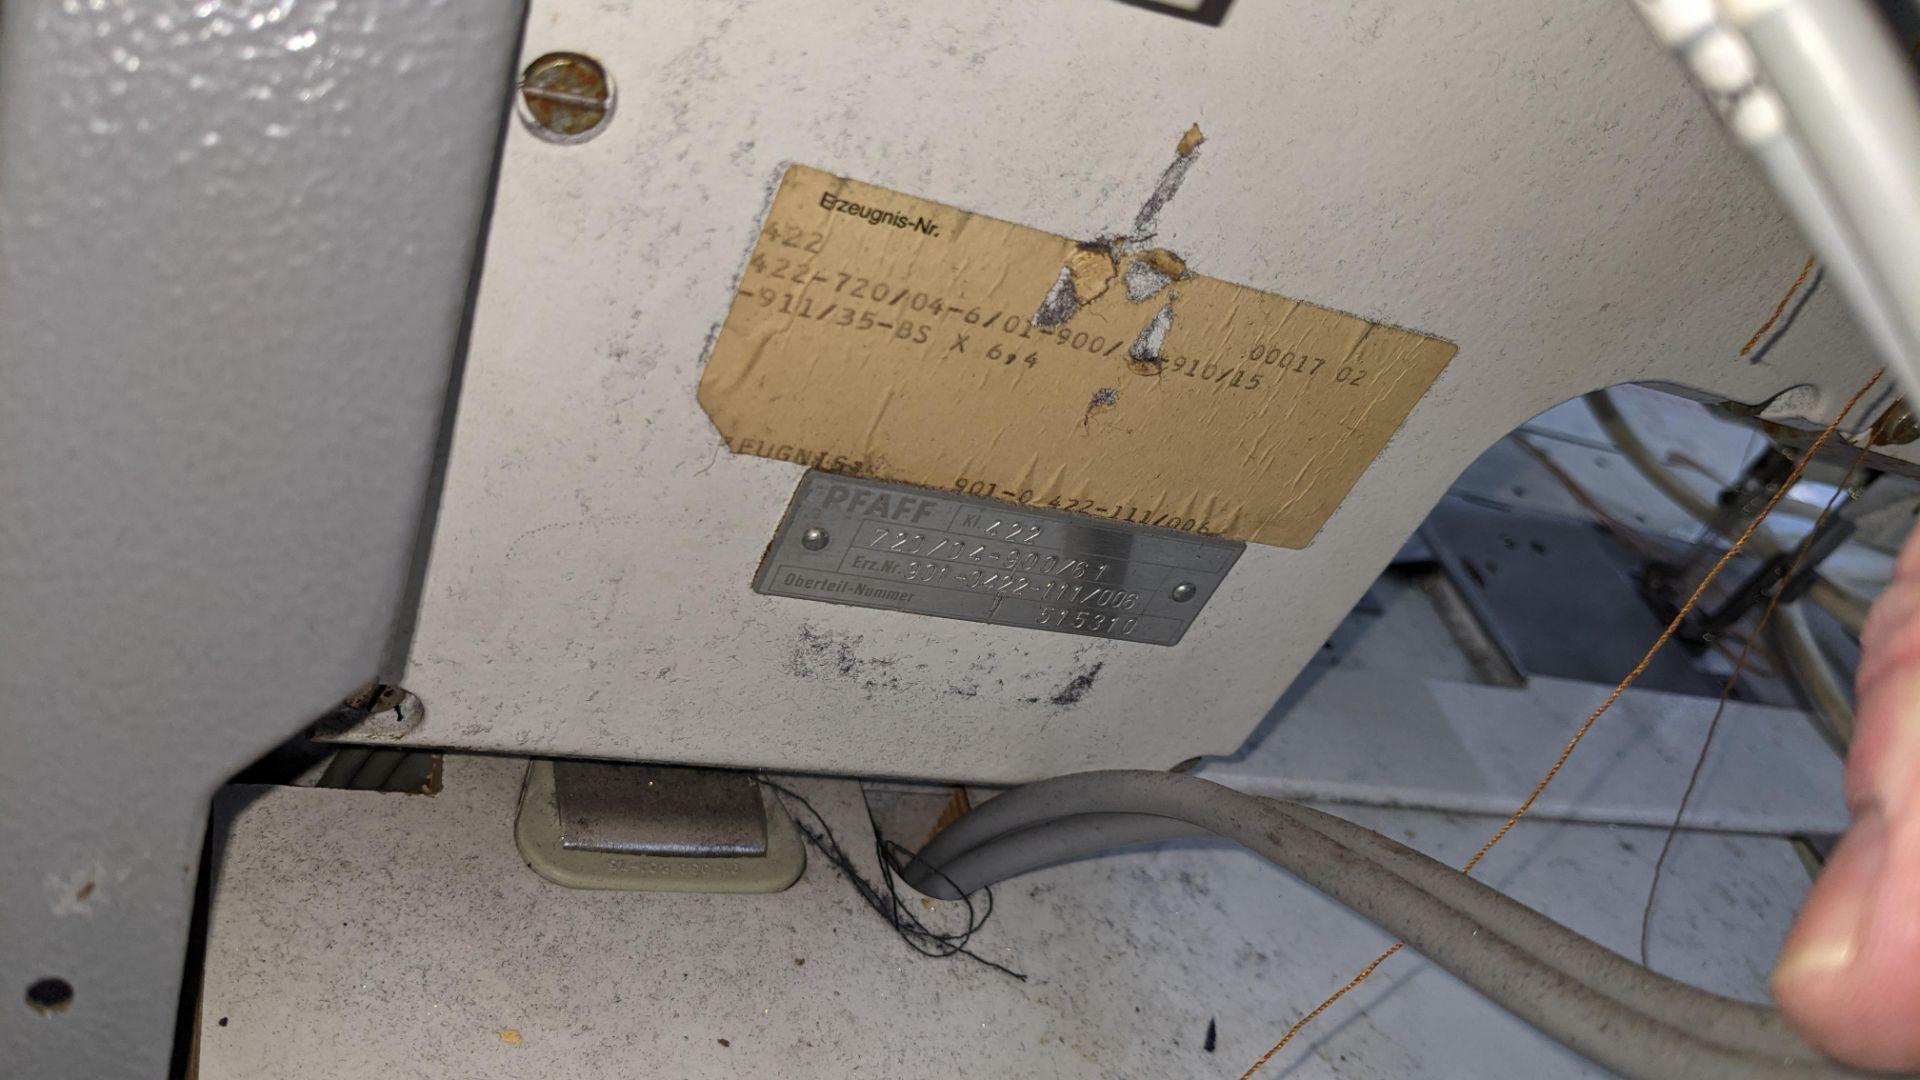 Pfaff twin needle sewing machine, model 422 - Image 12 of 17